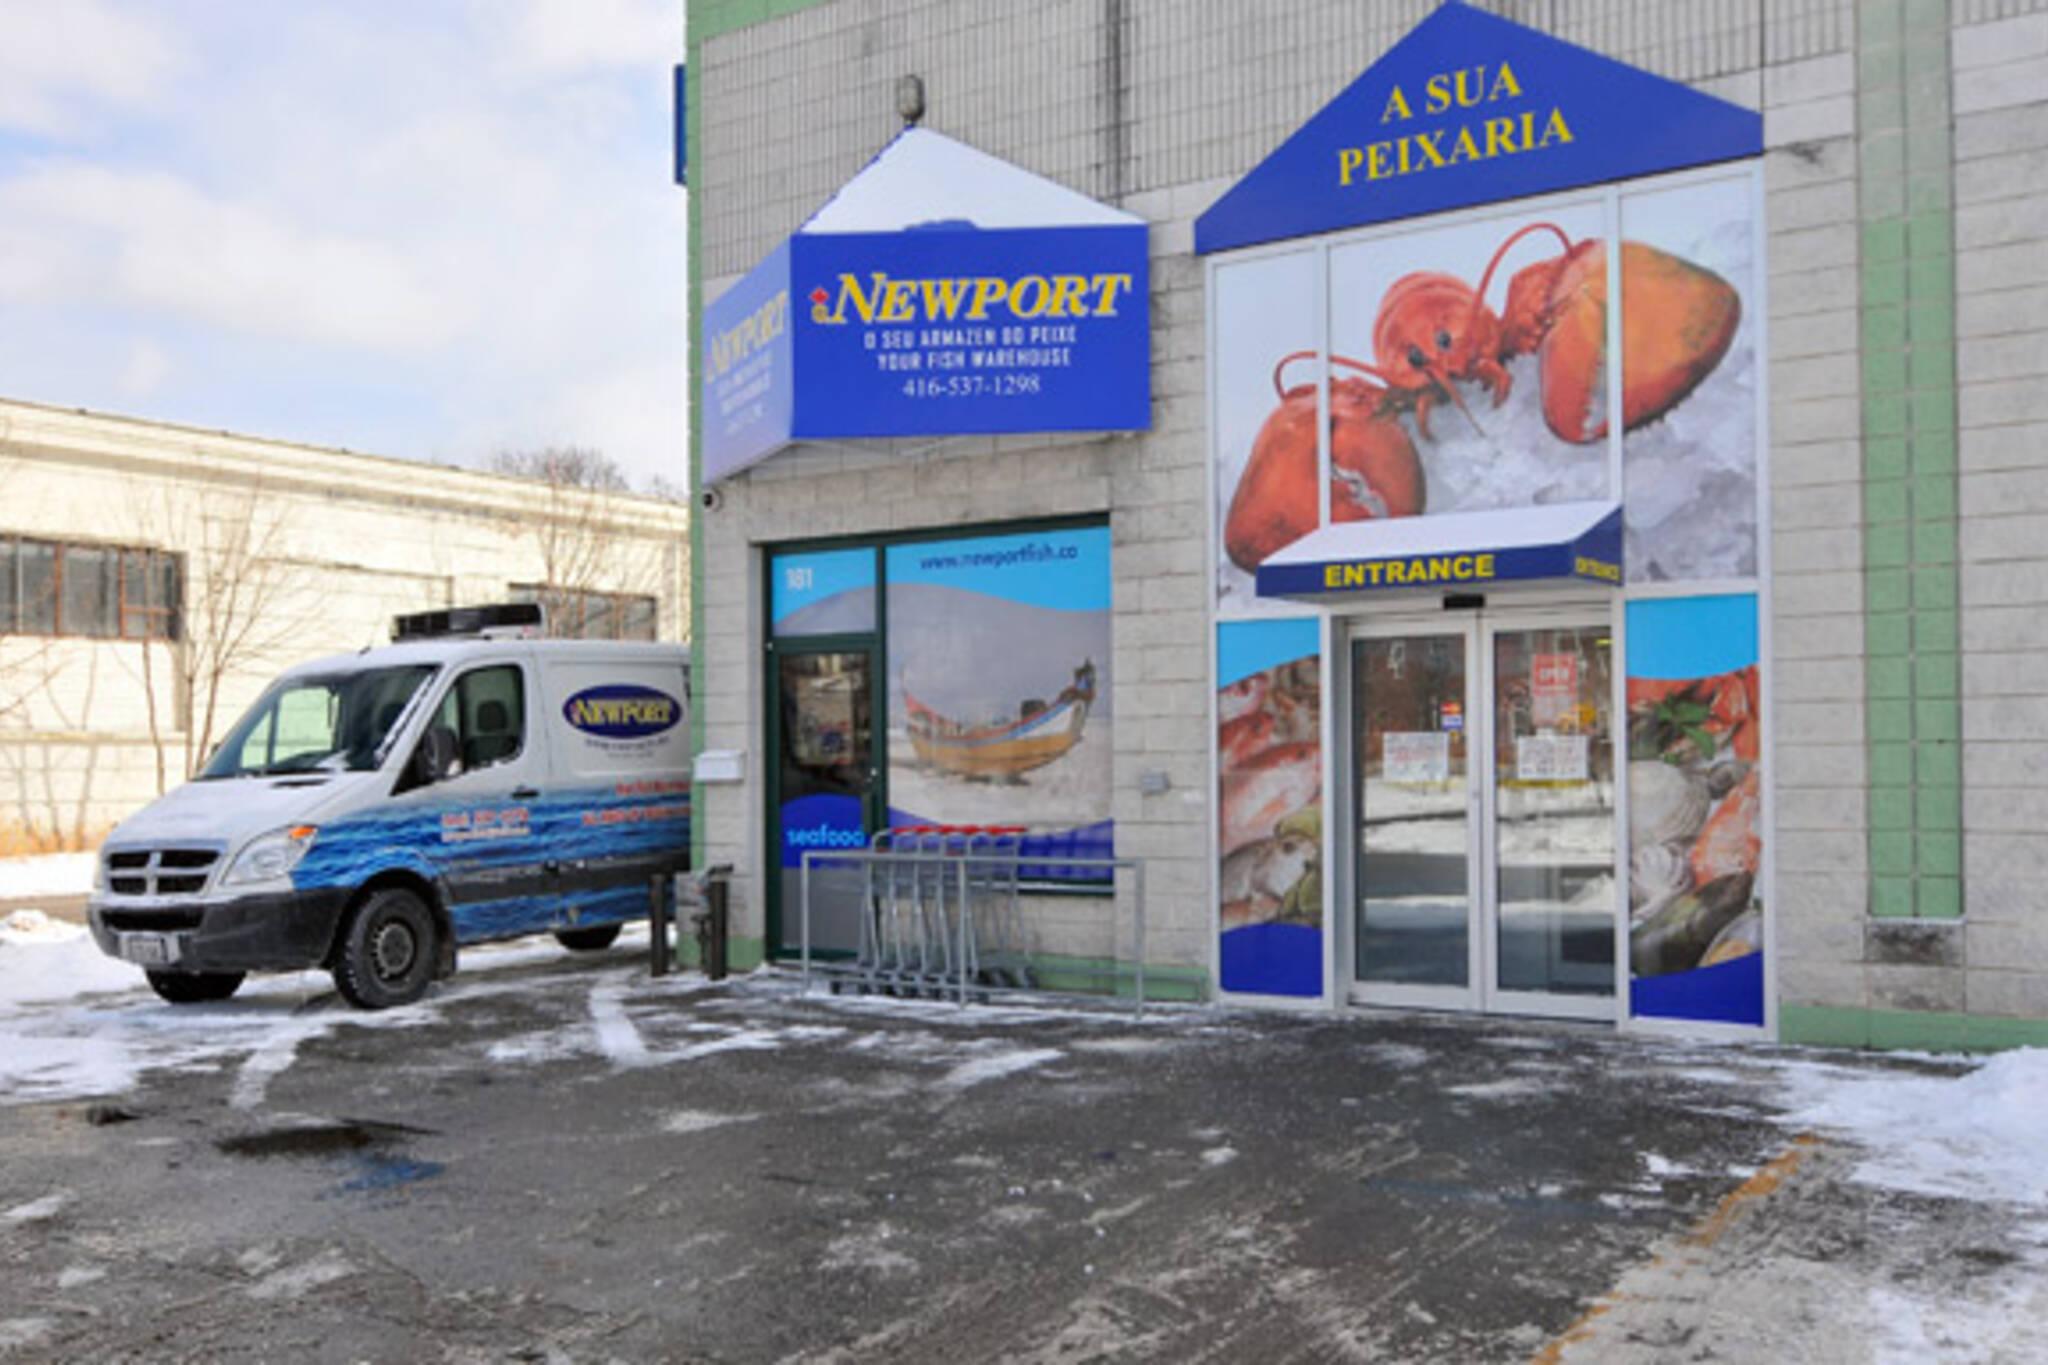 Newport Fish Importers